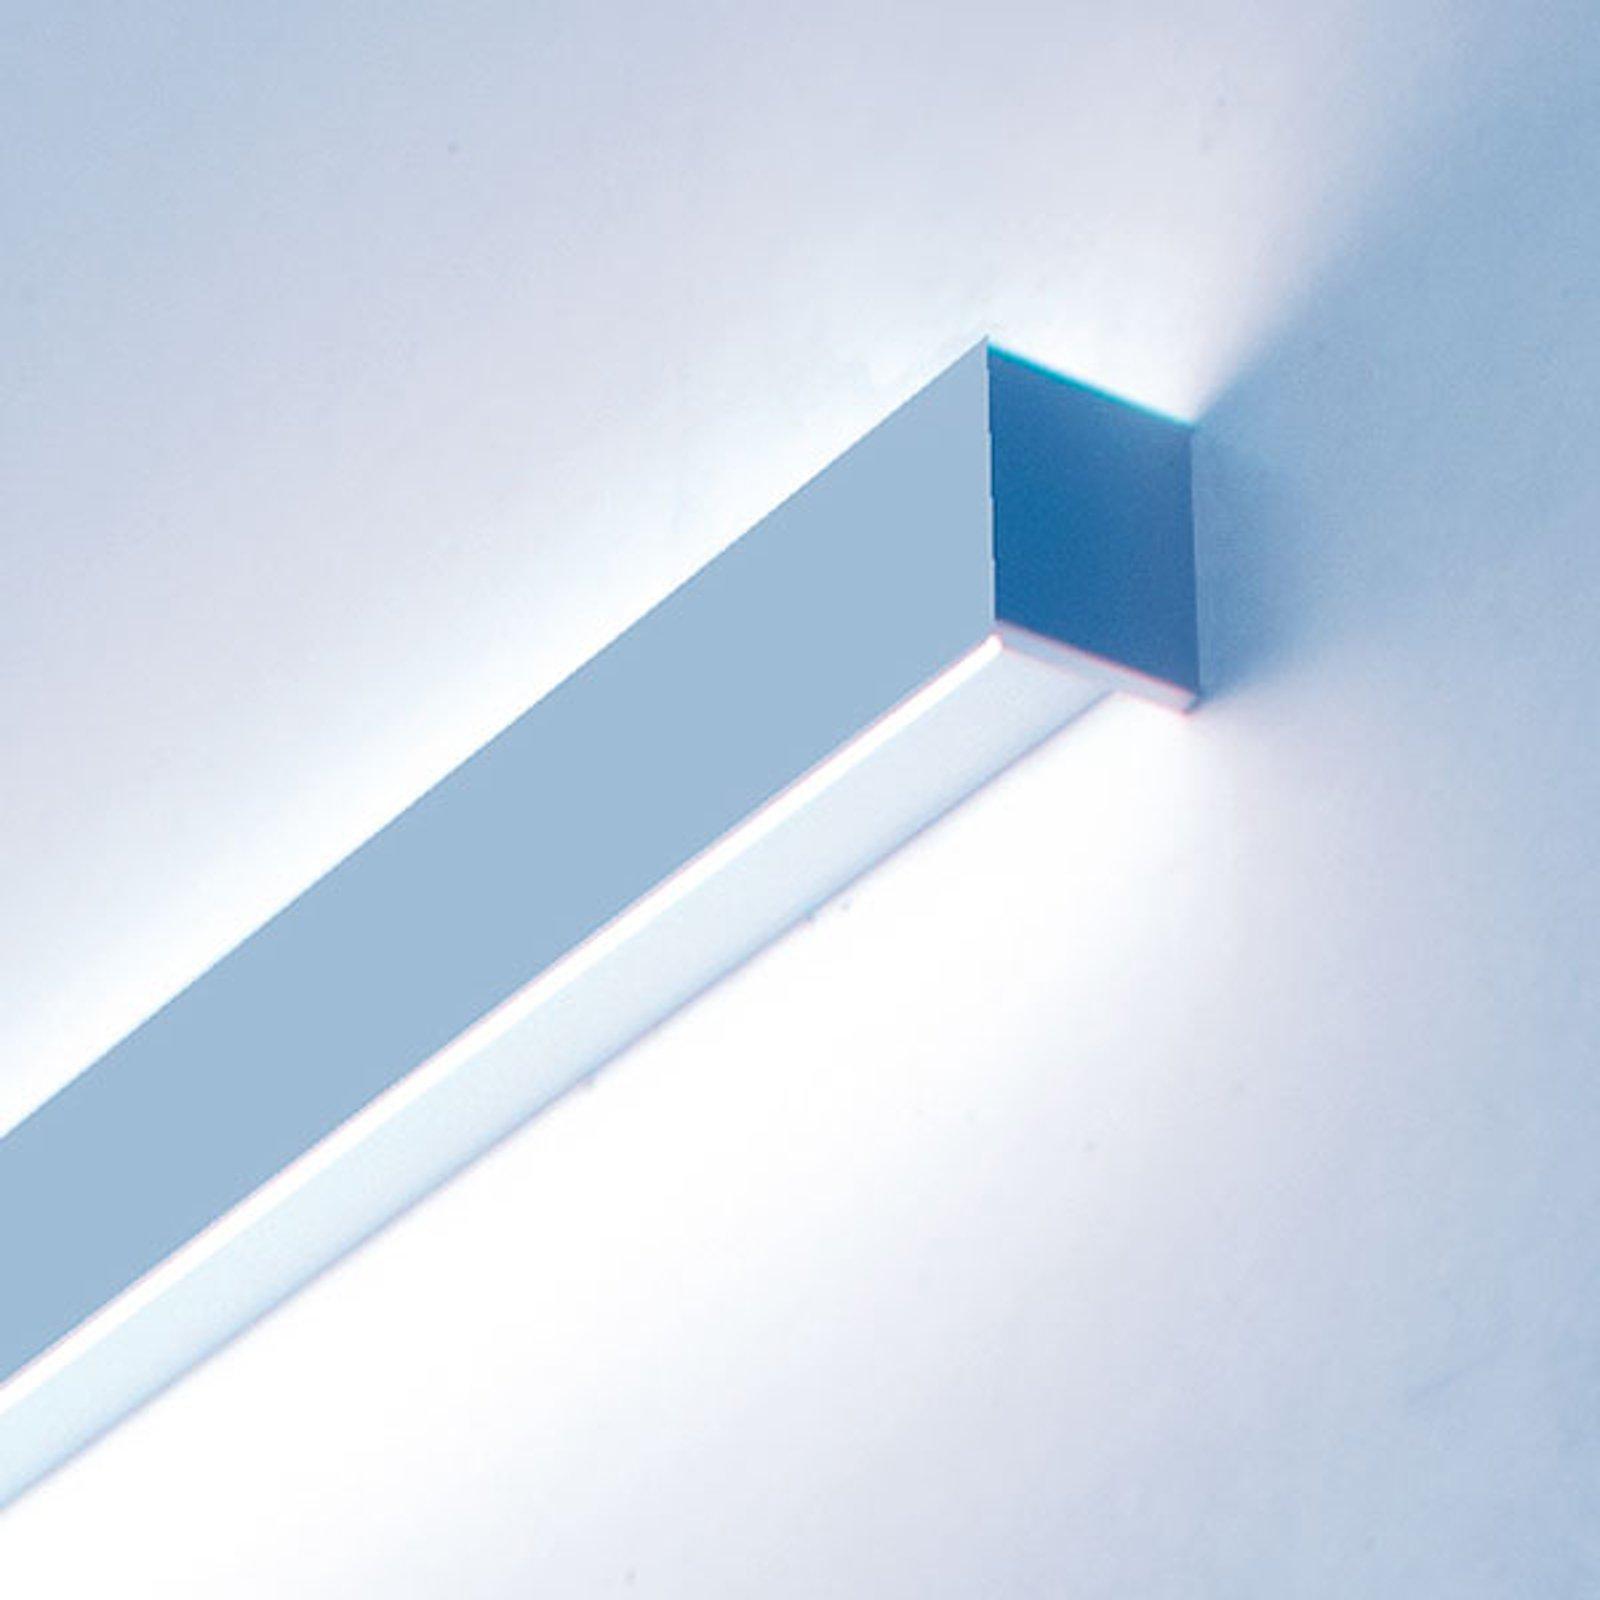 Matric W1 LED-vegglampe i 89,5 cm, 4 000 K